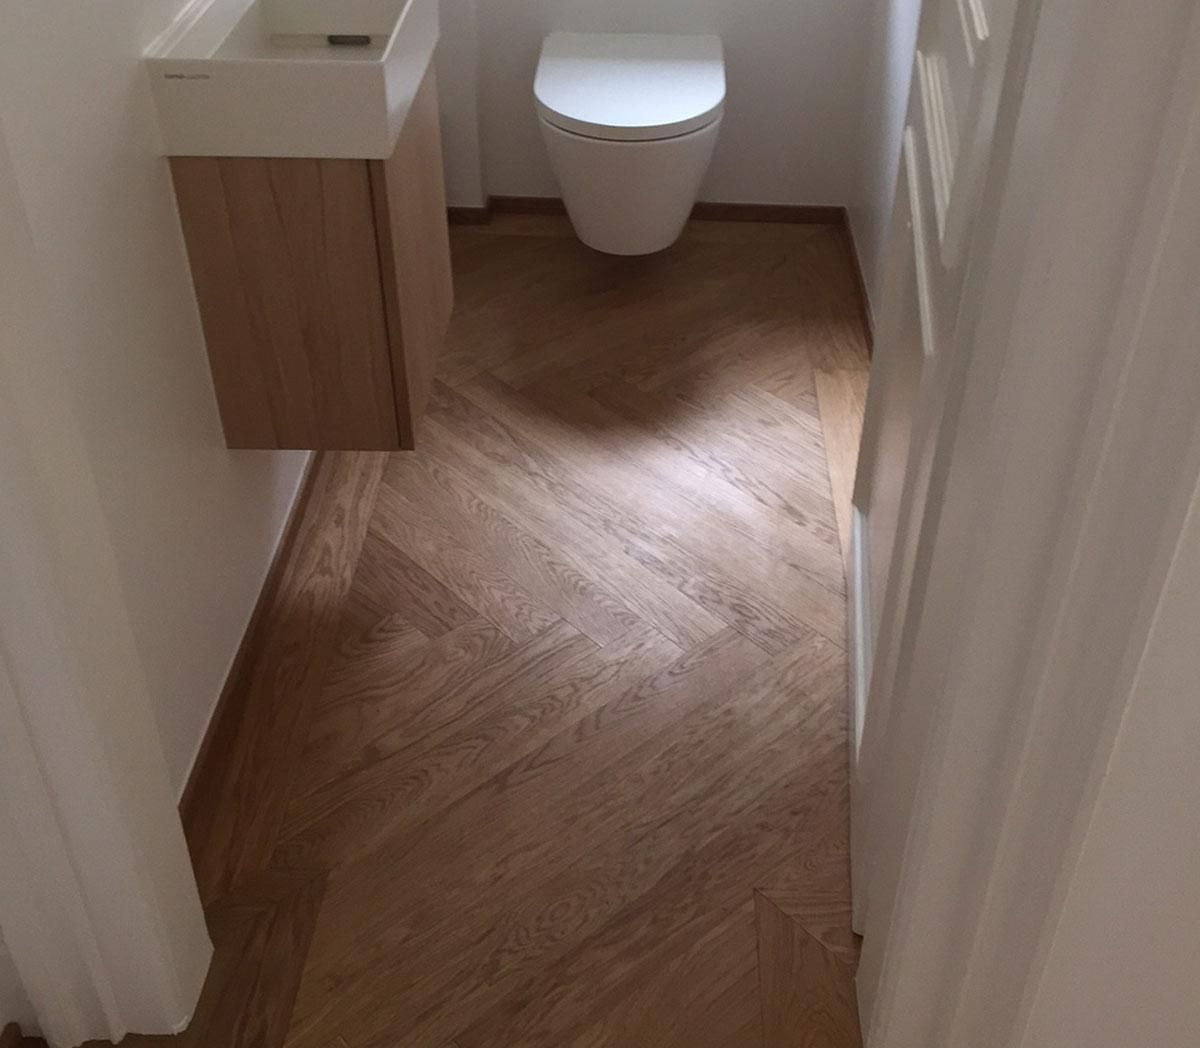 ferrer floors ag parkett bodenbel ge linoleum pvc kautschuk teppiche designbel ge in reinach. Black Bedroom Furniture Sets. Home Design Ideas